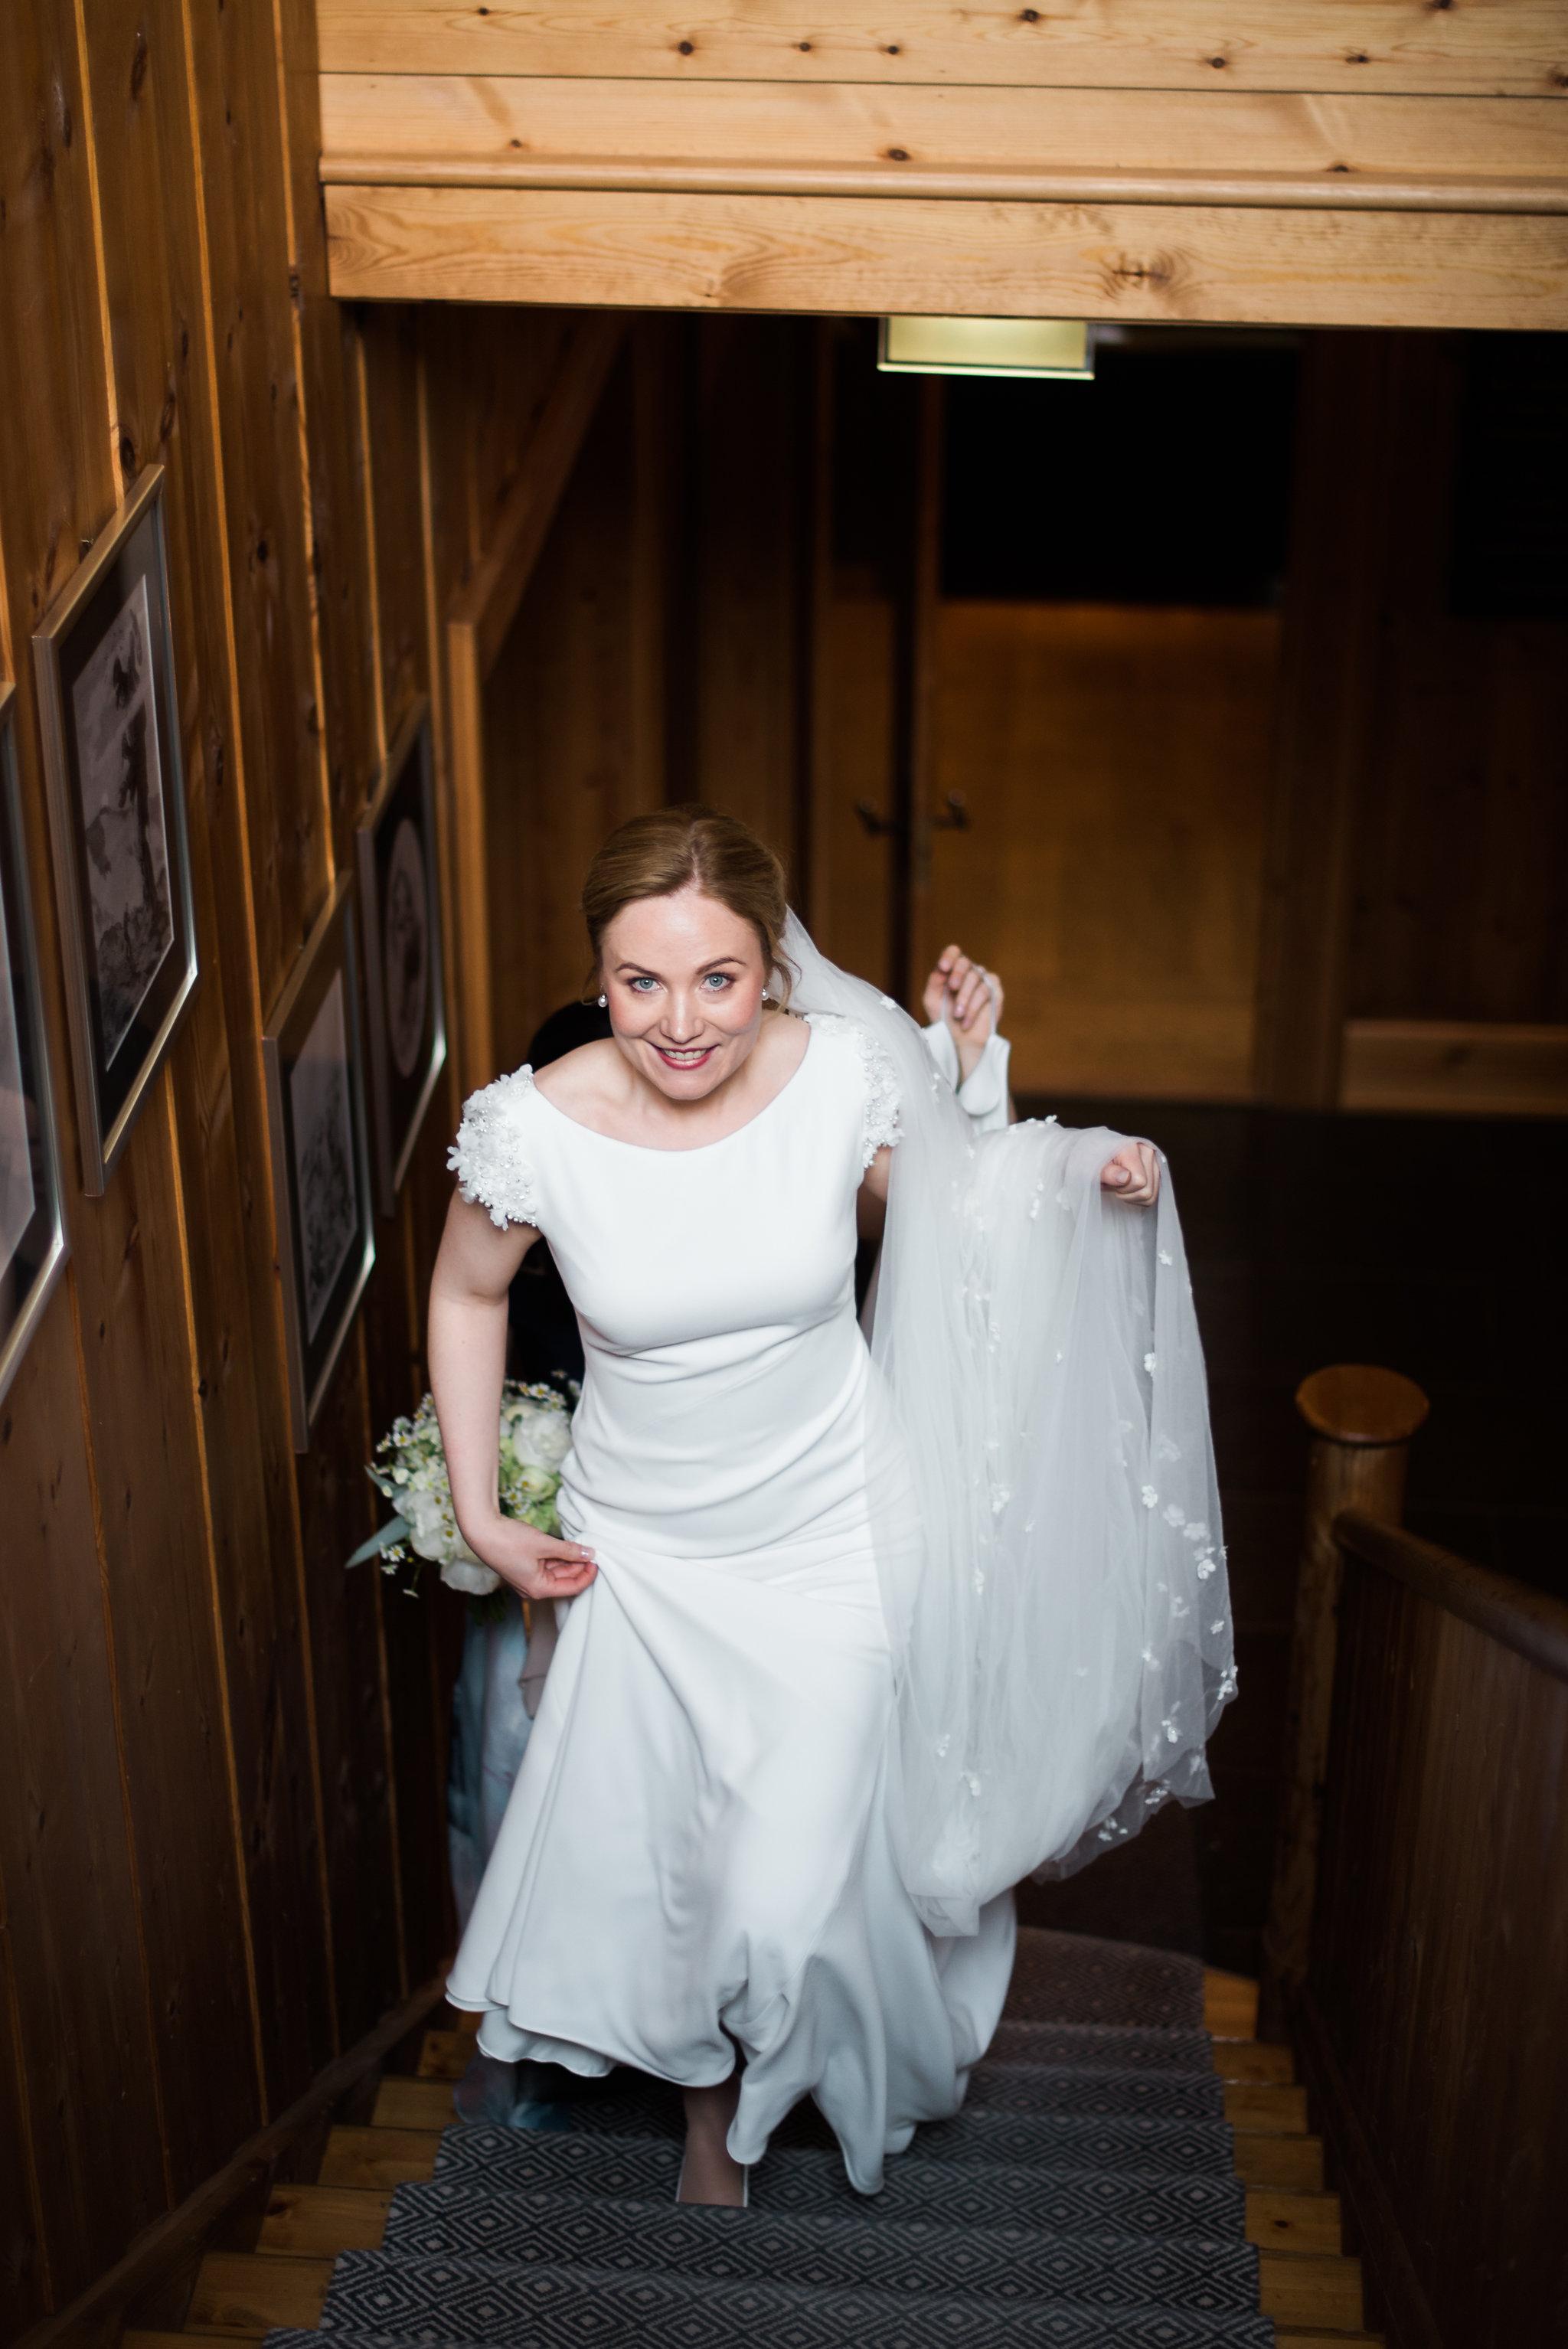 Pixlight-Bryllup-Nina-Thorbjorn284fotograf-holmekolen-oslo.jpg